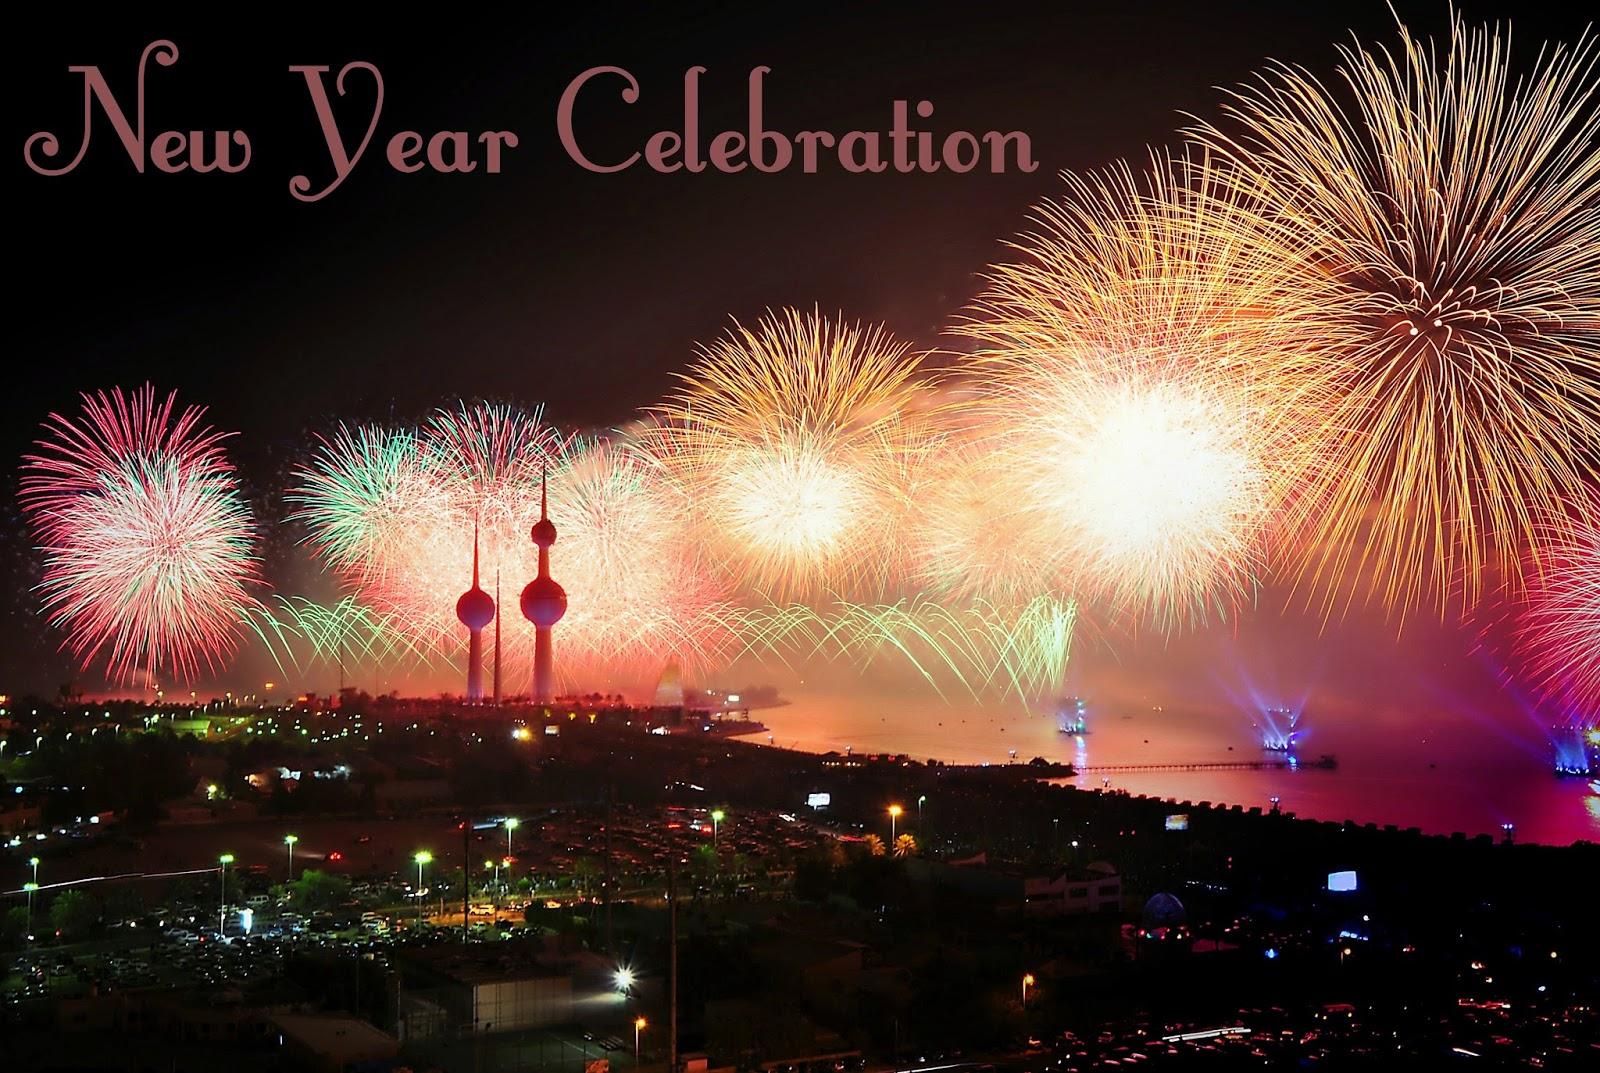 Top 5 Romantic Cities To Celebrate Happy New Year 2016